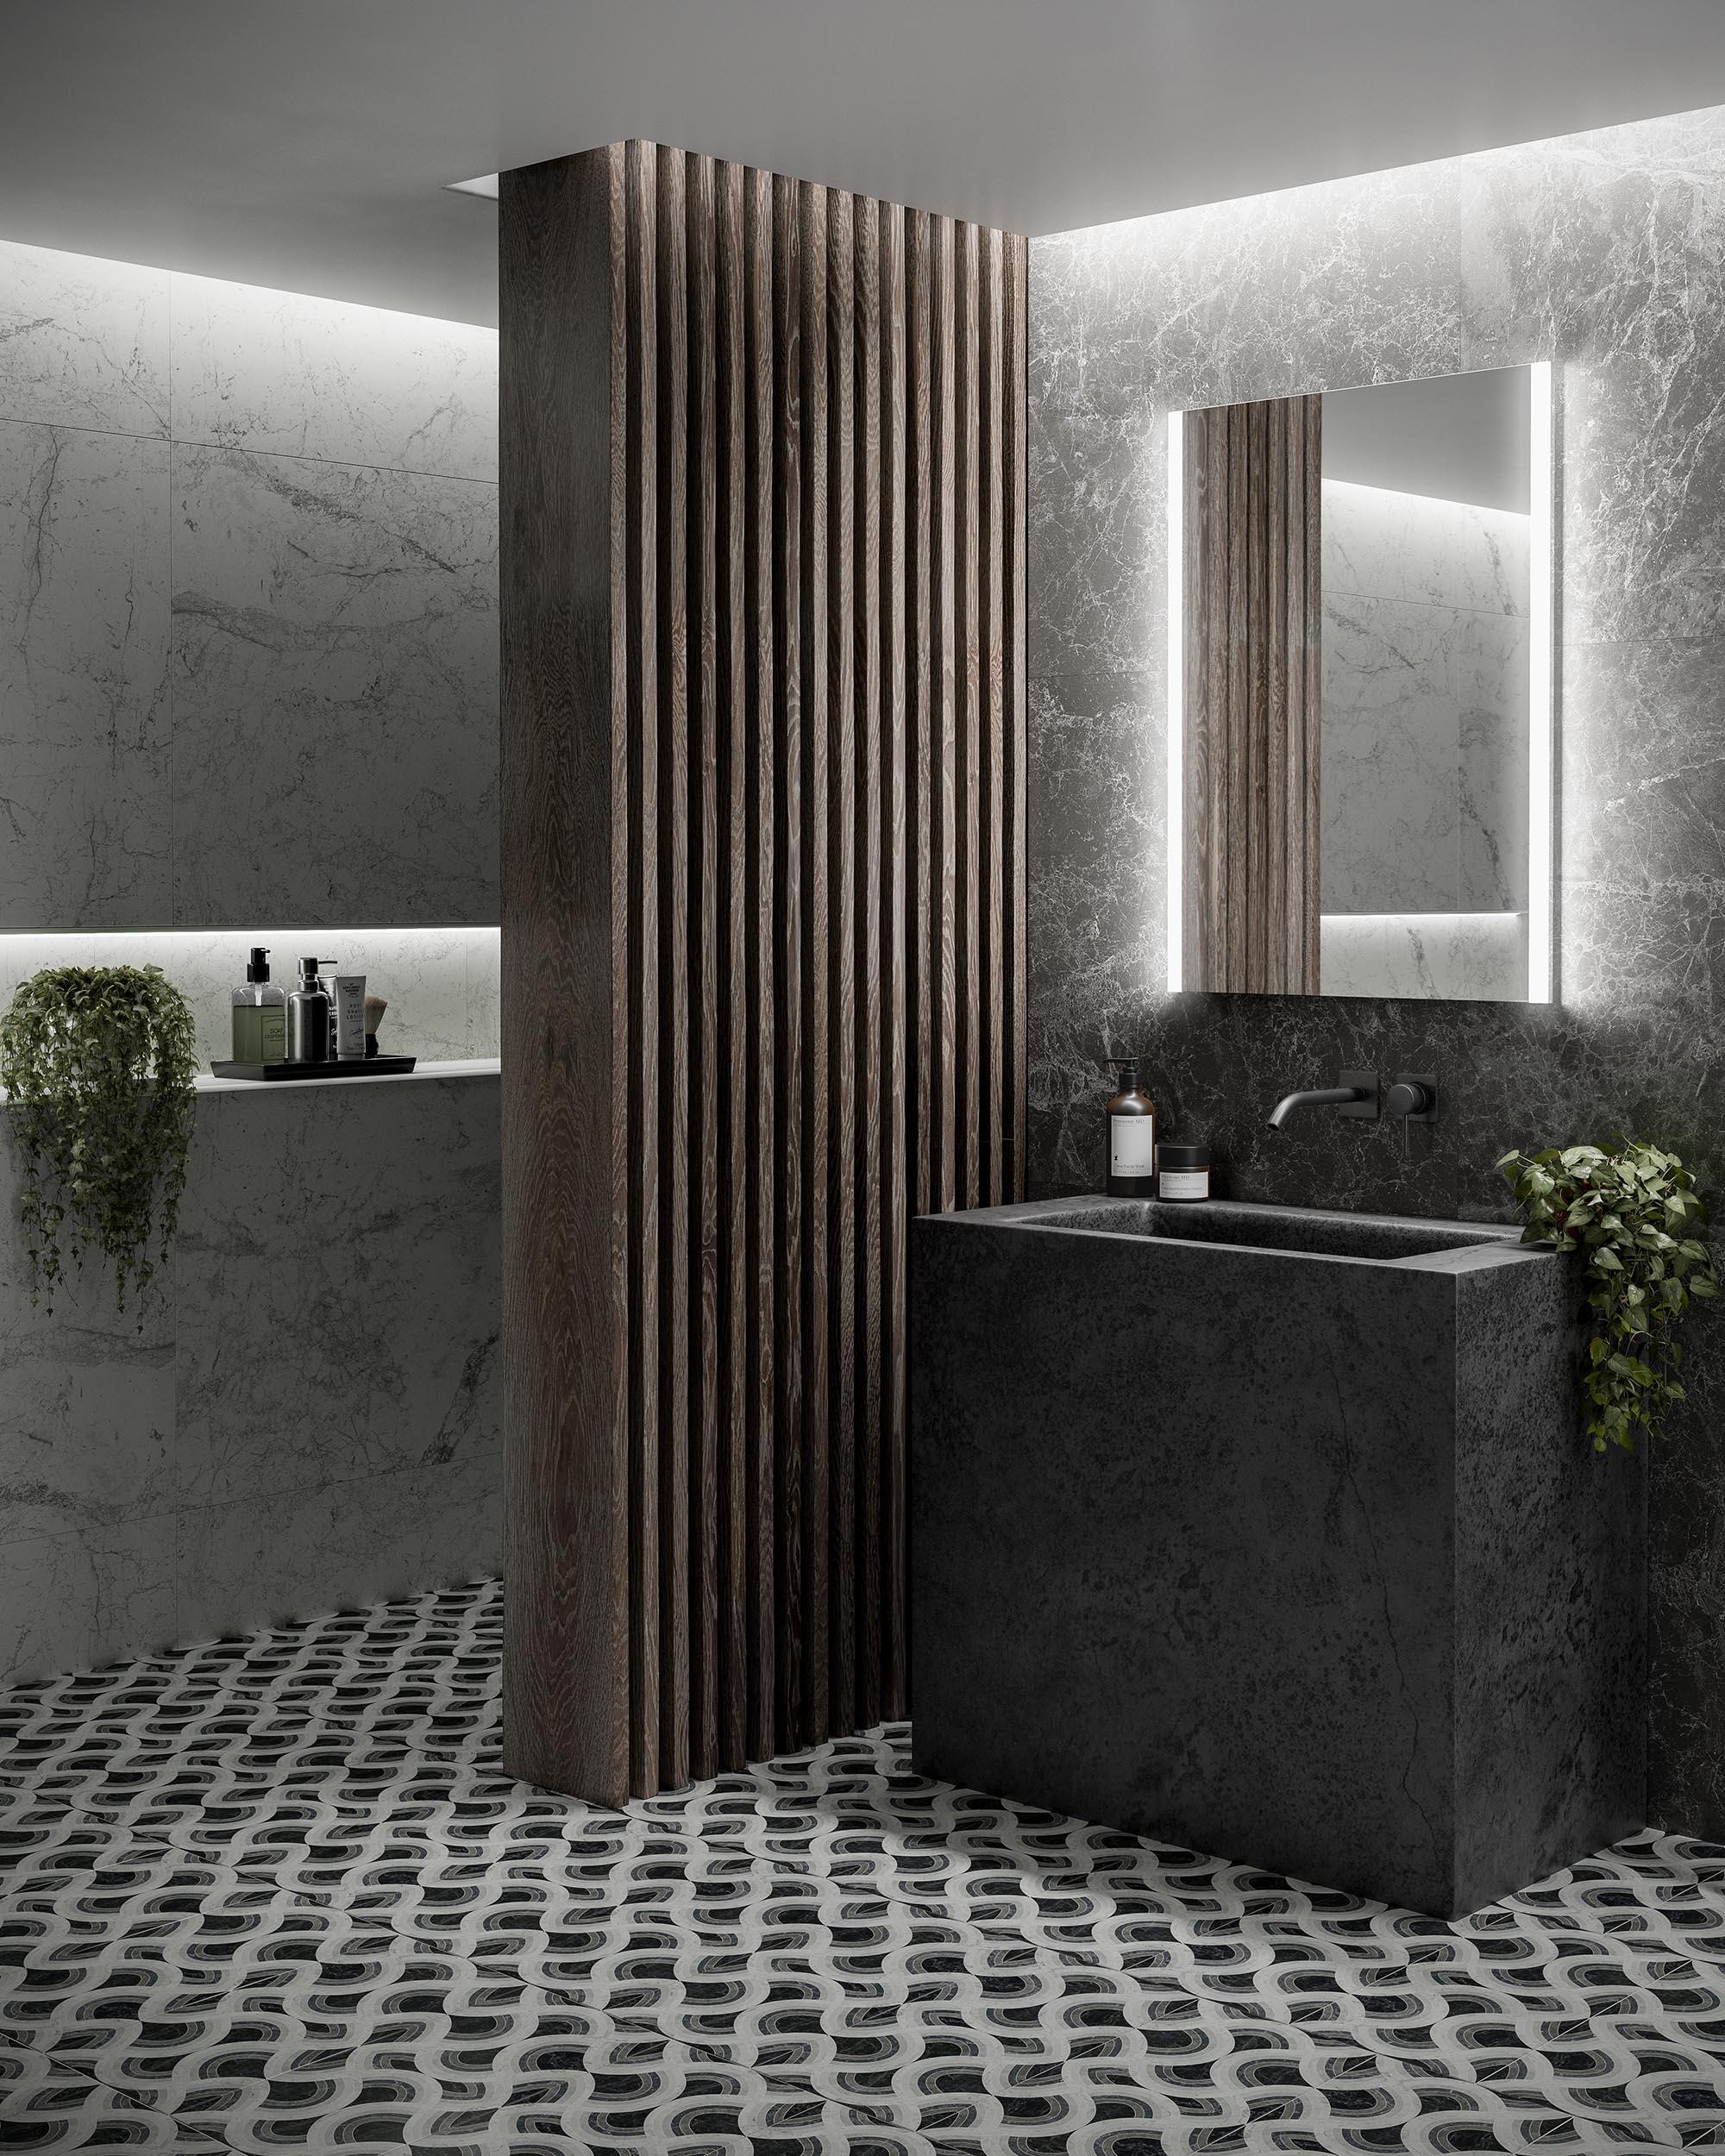 Illuminated Bathroom Mirrors and Lights 1